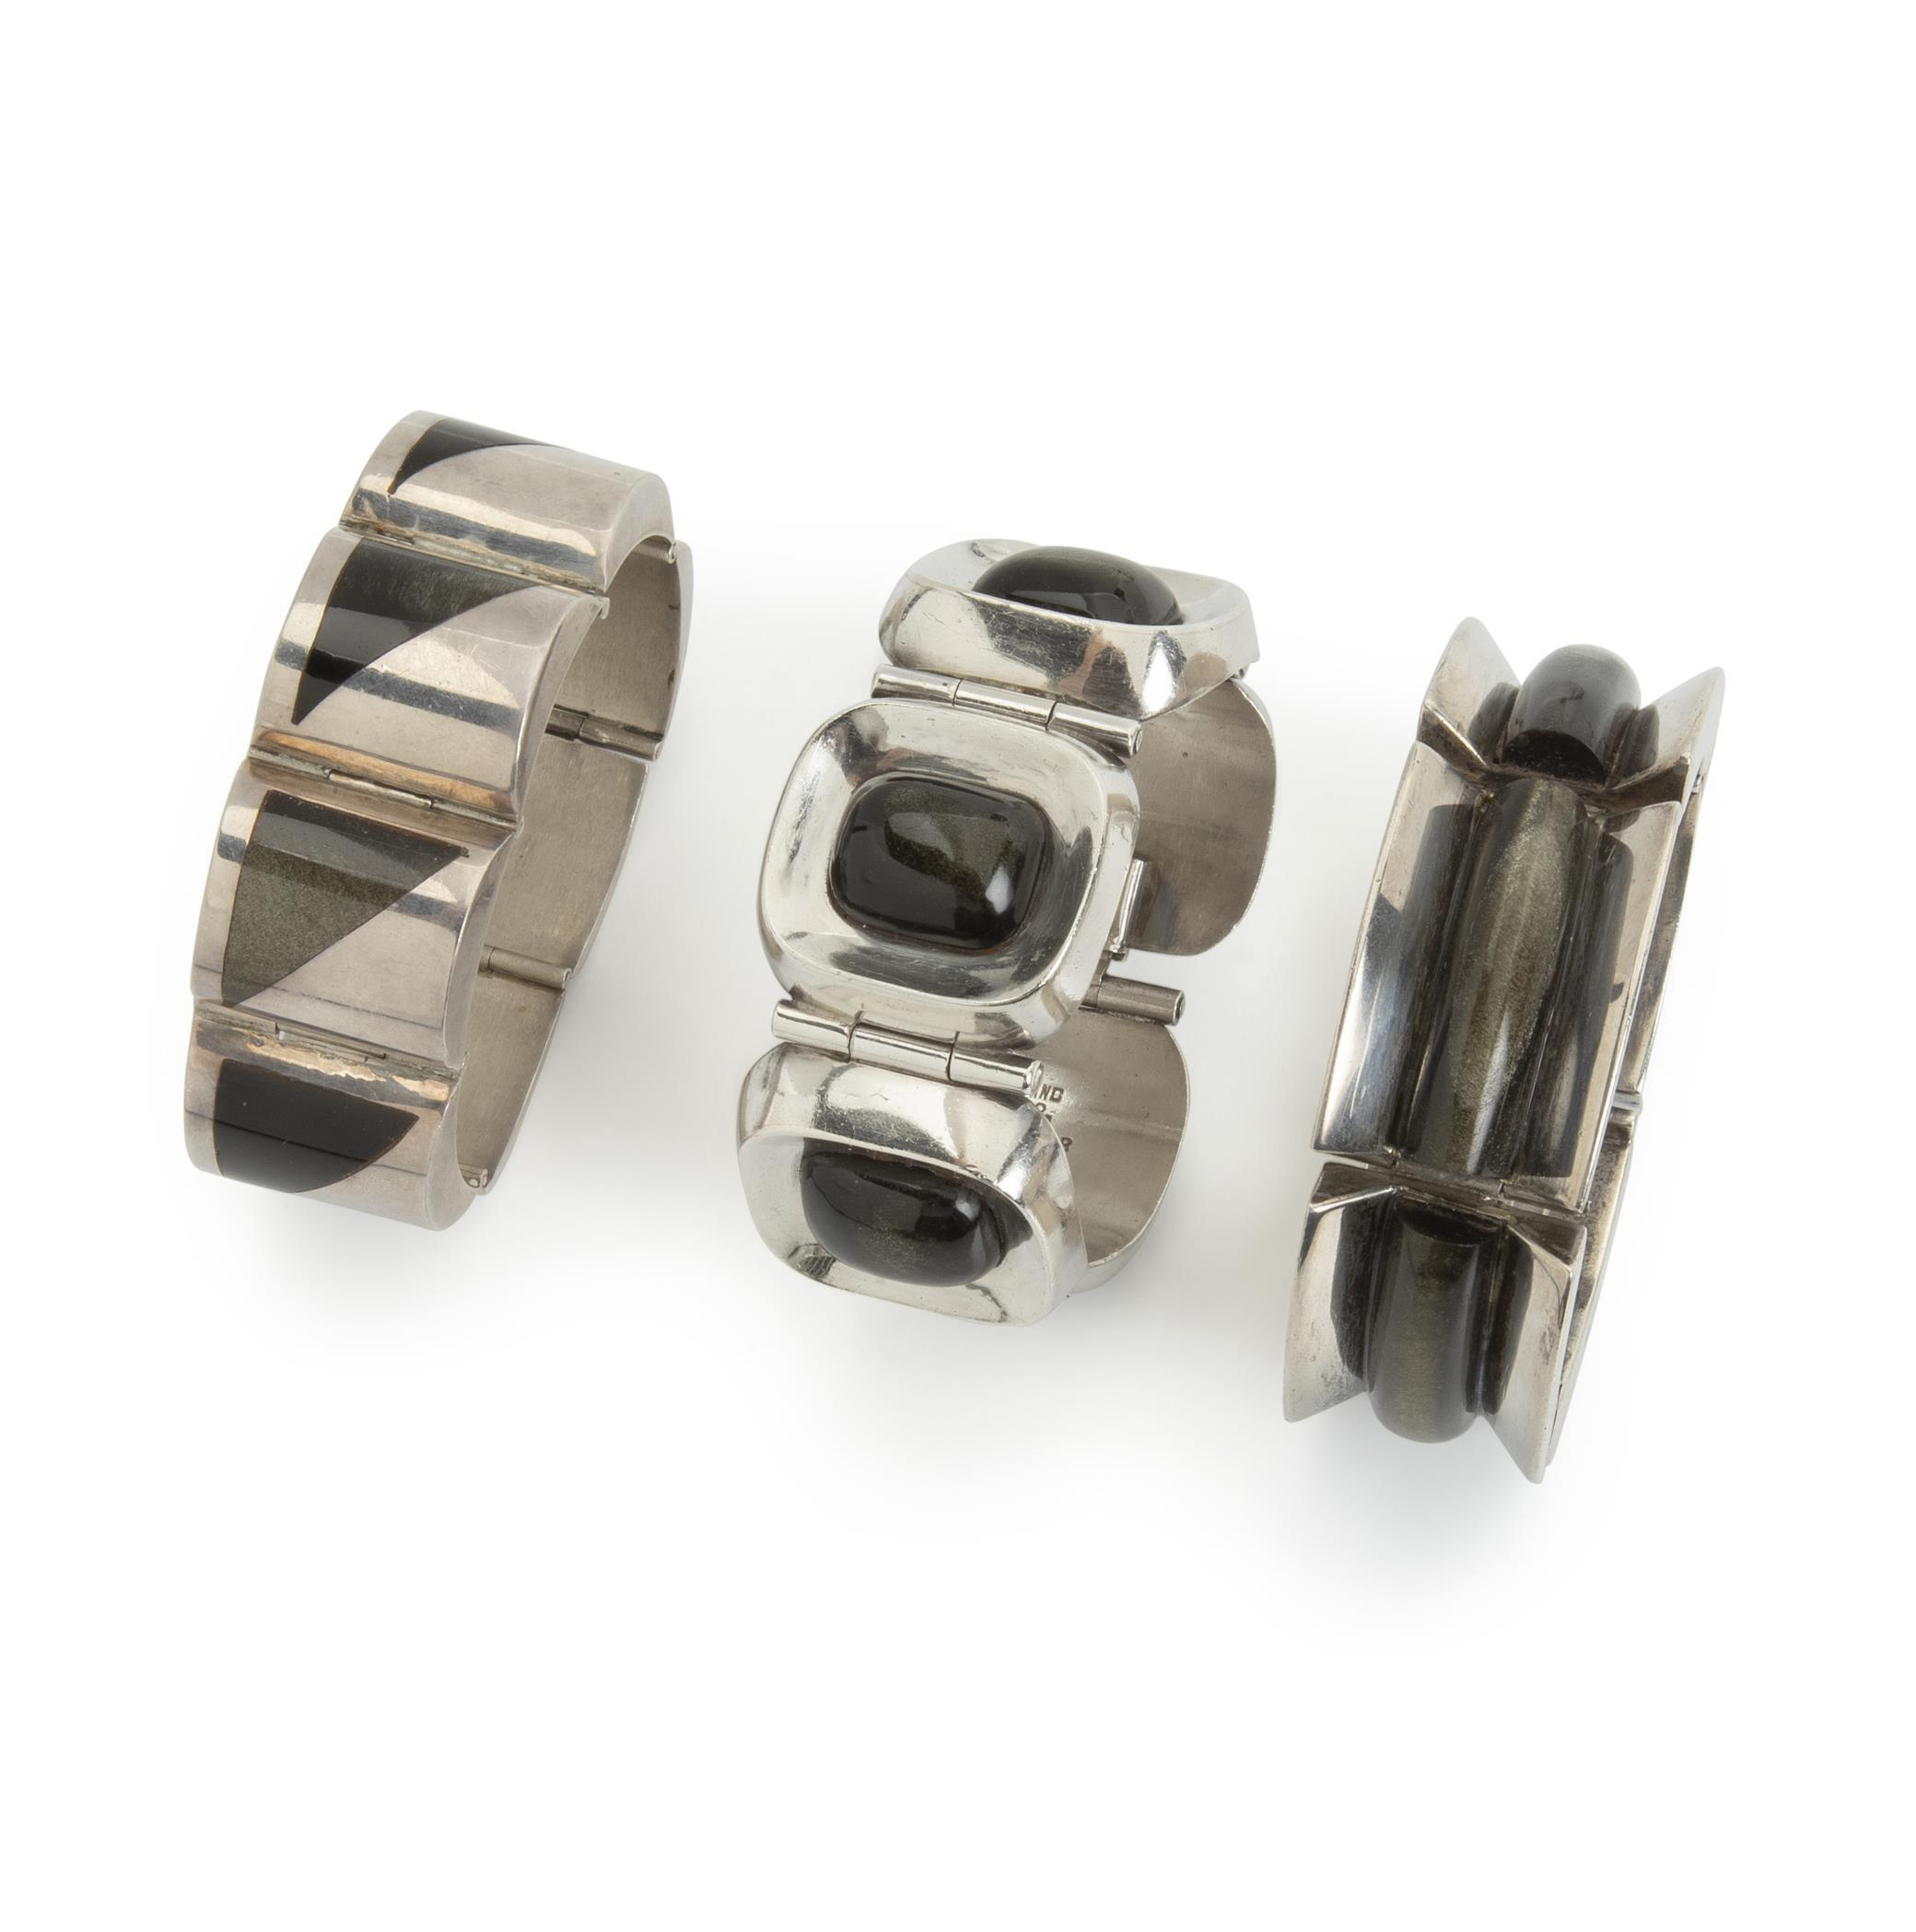 Three Enrique Ledesma sterling silver and obsidian bracelets